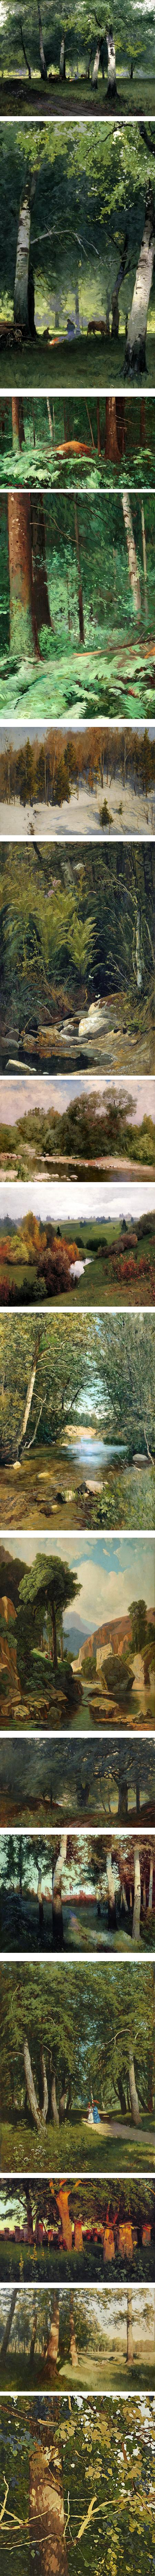 Andrei Nikolaievich Schilder, Russian landscape painter